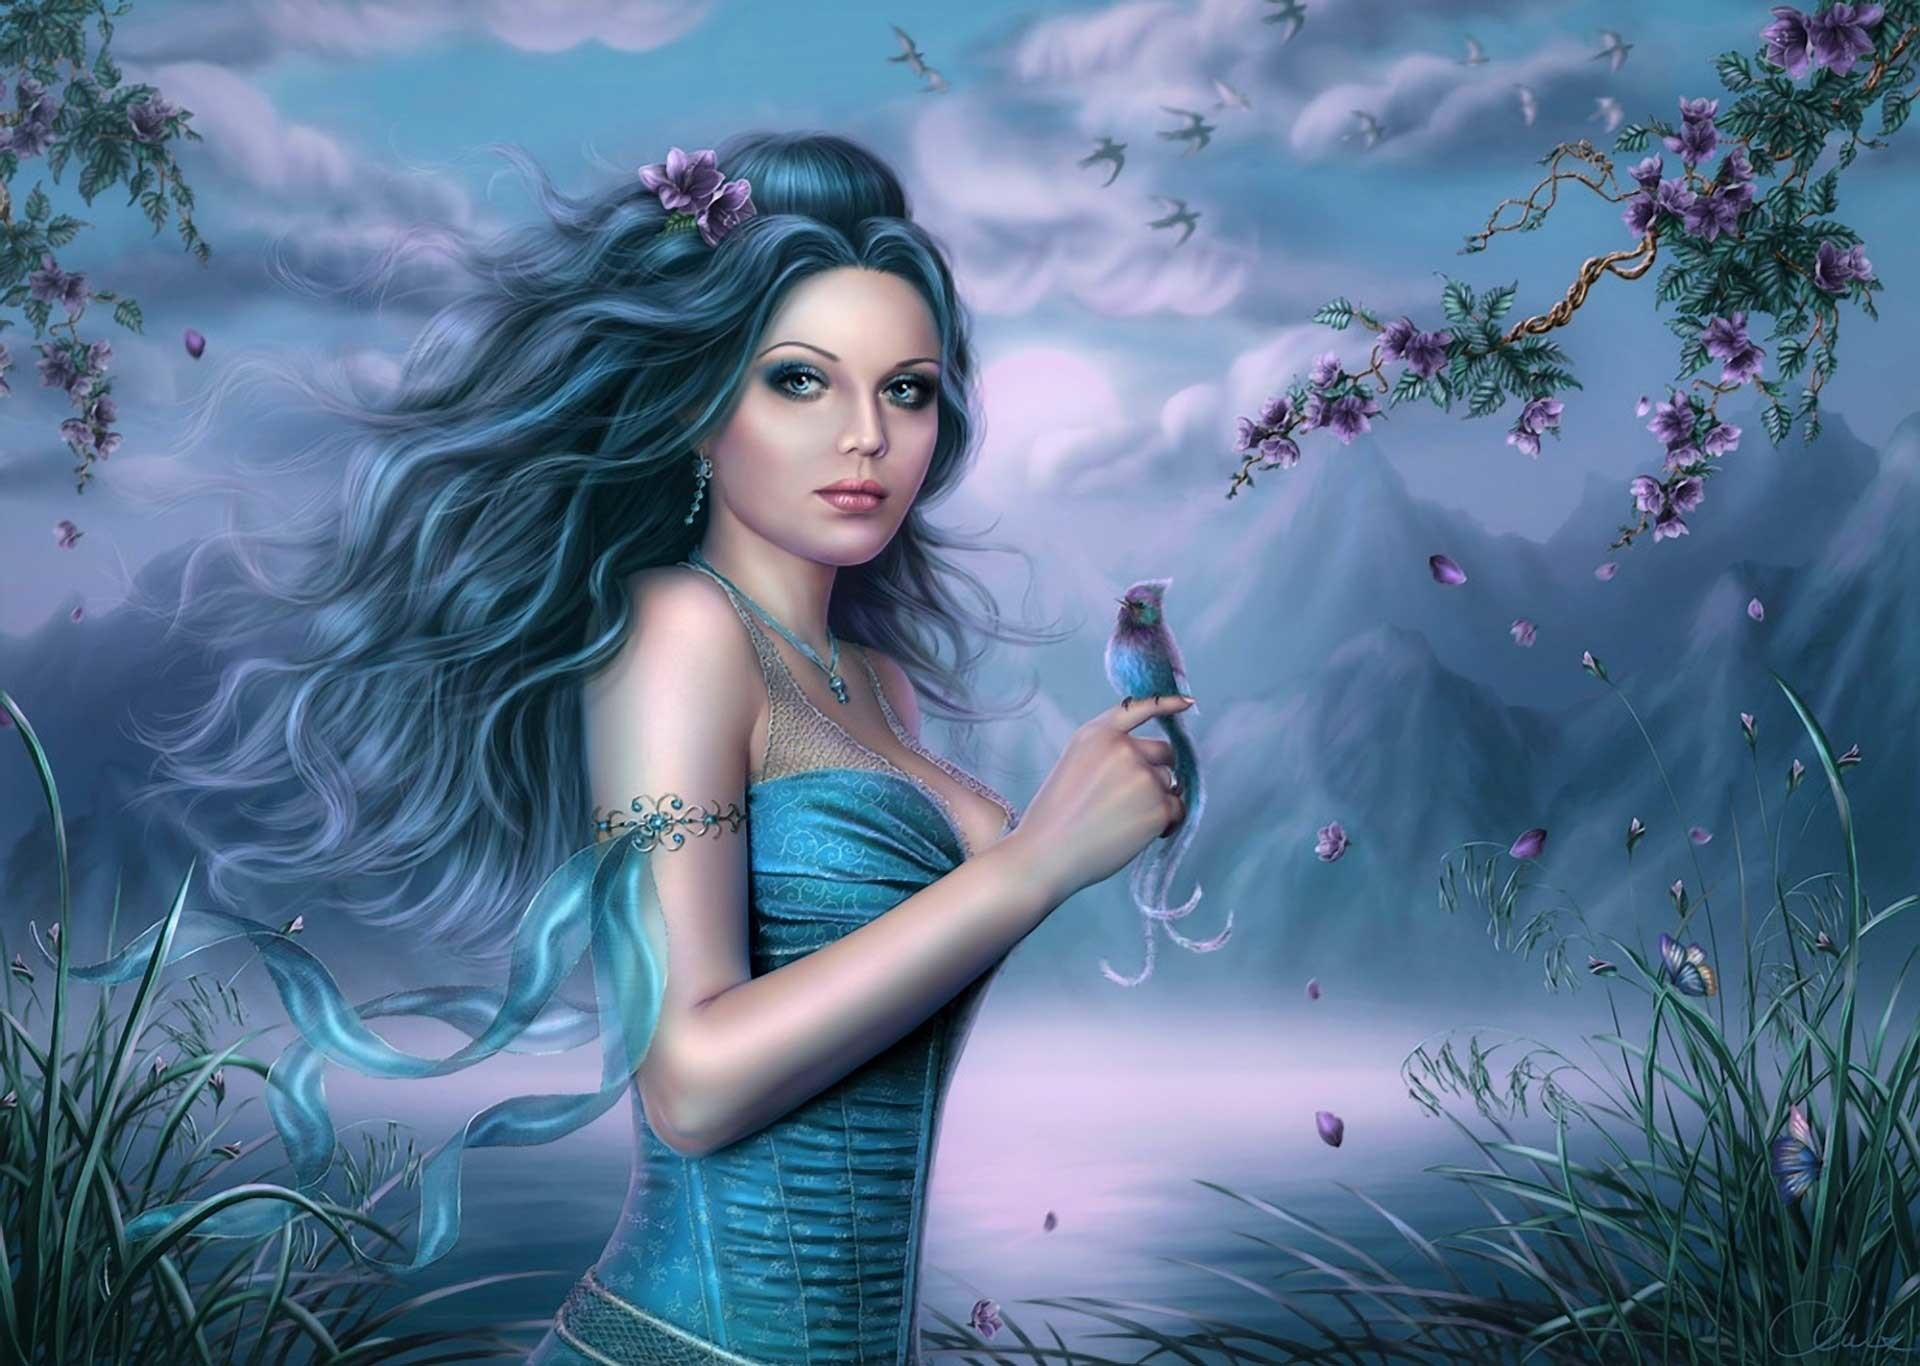 3d fantasy women wallpaper